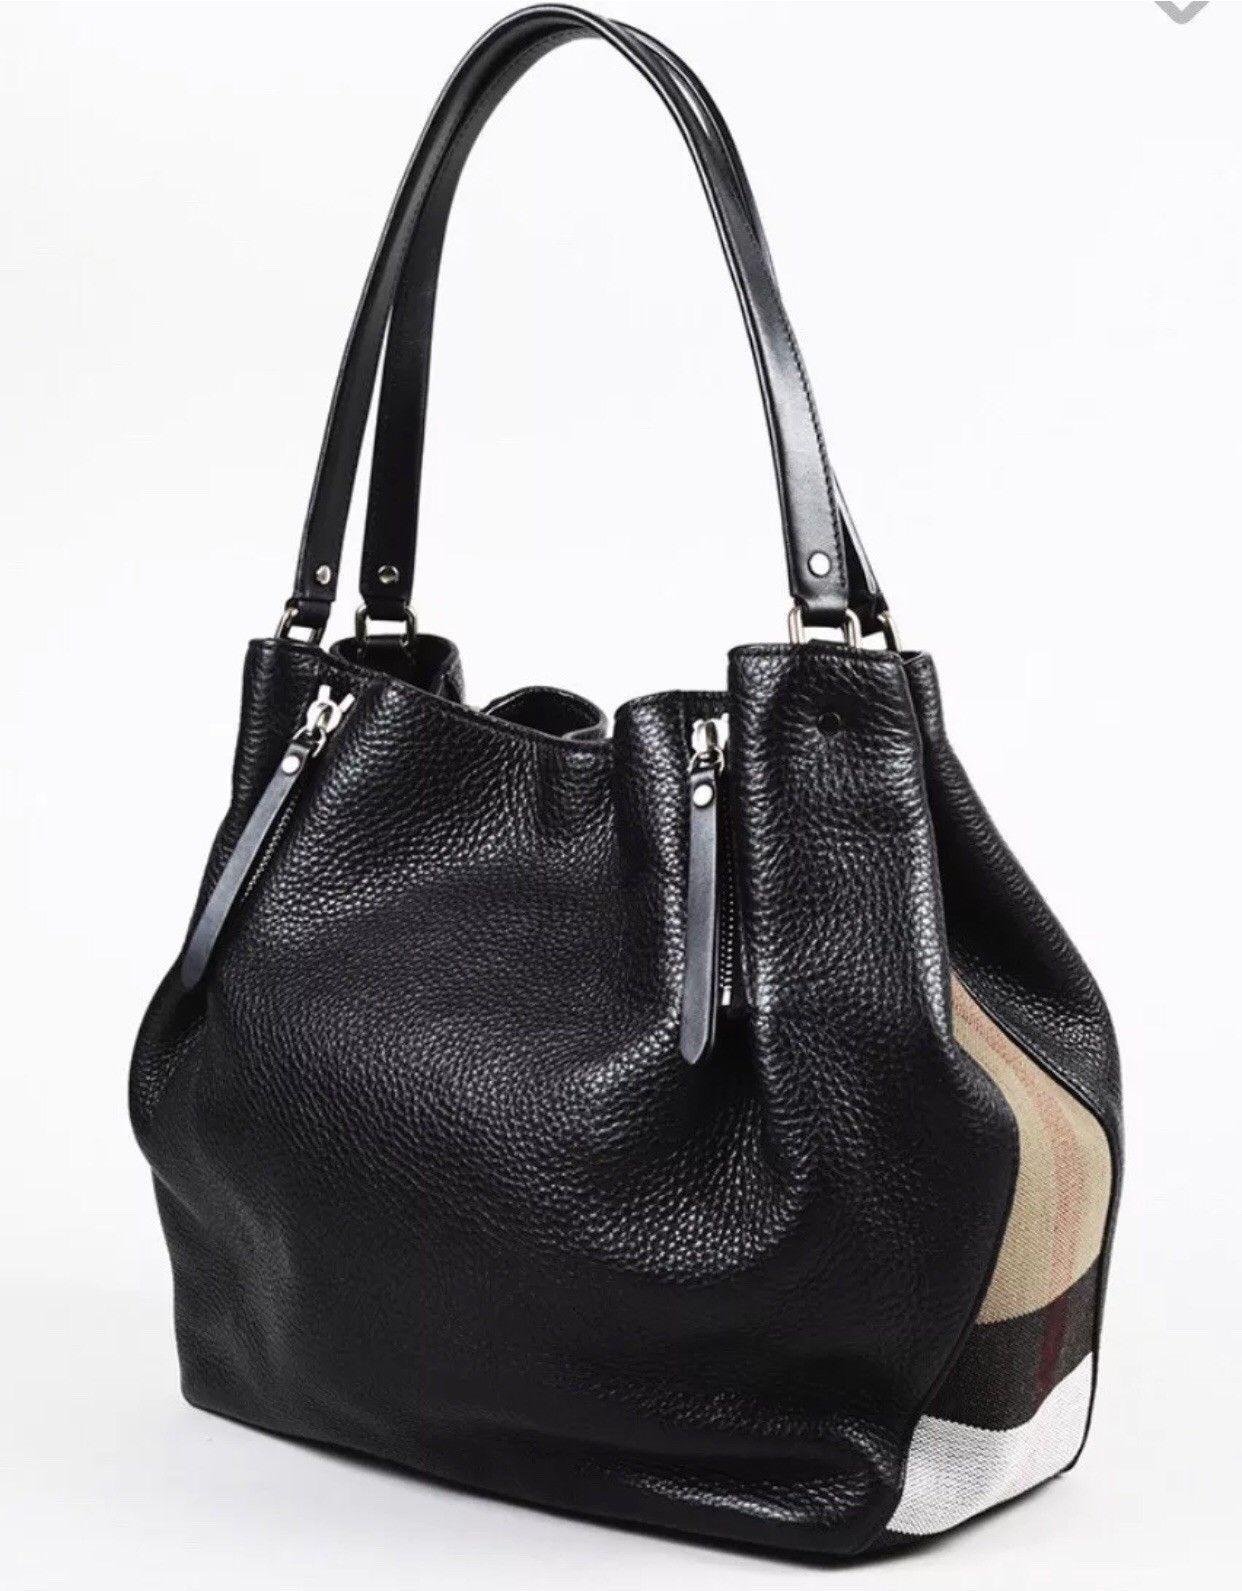 9408730d1670 Burberry Women s Brit Medium Maidstone Leather and Canvas Handbag Black   499.0